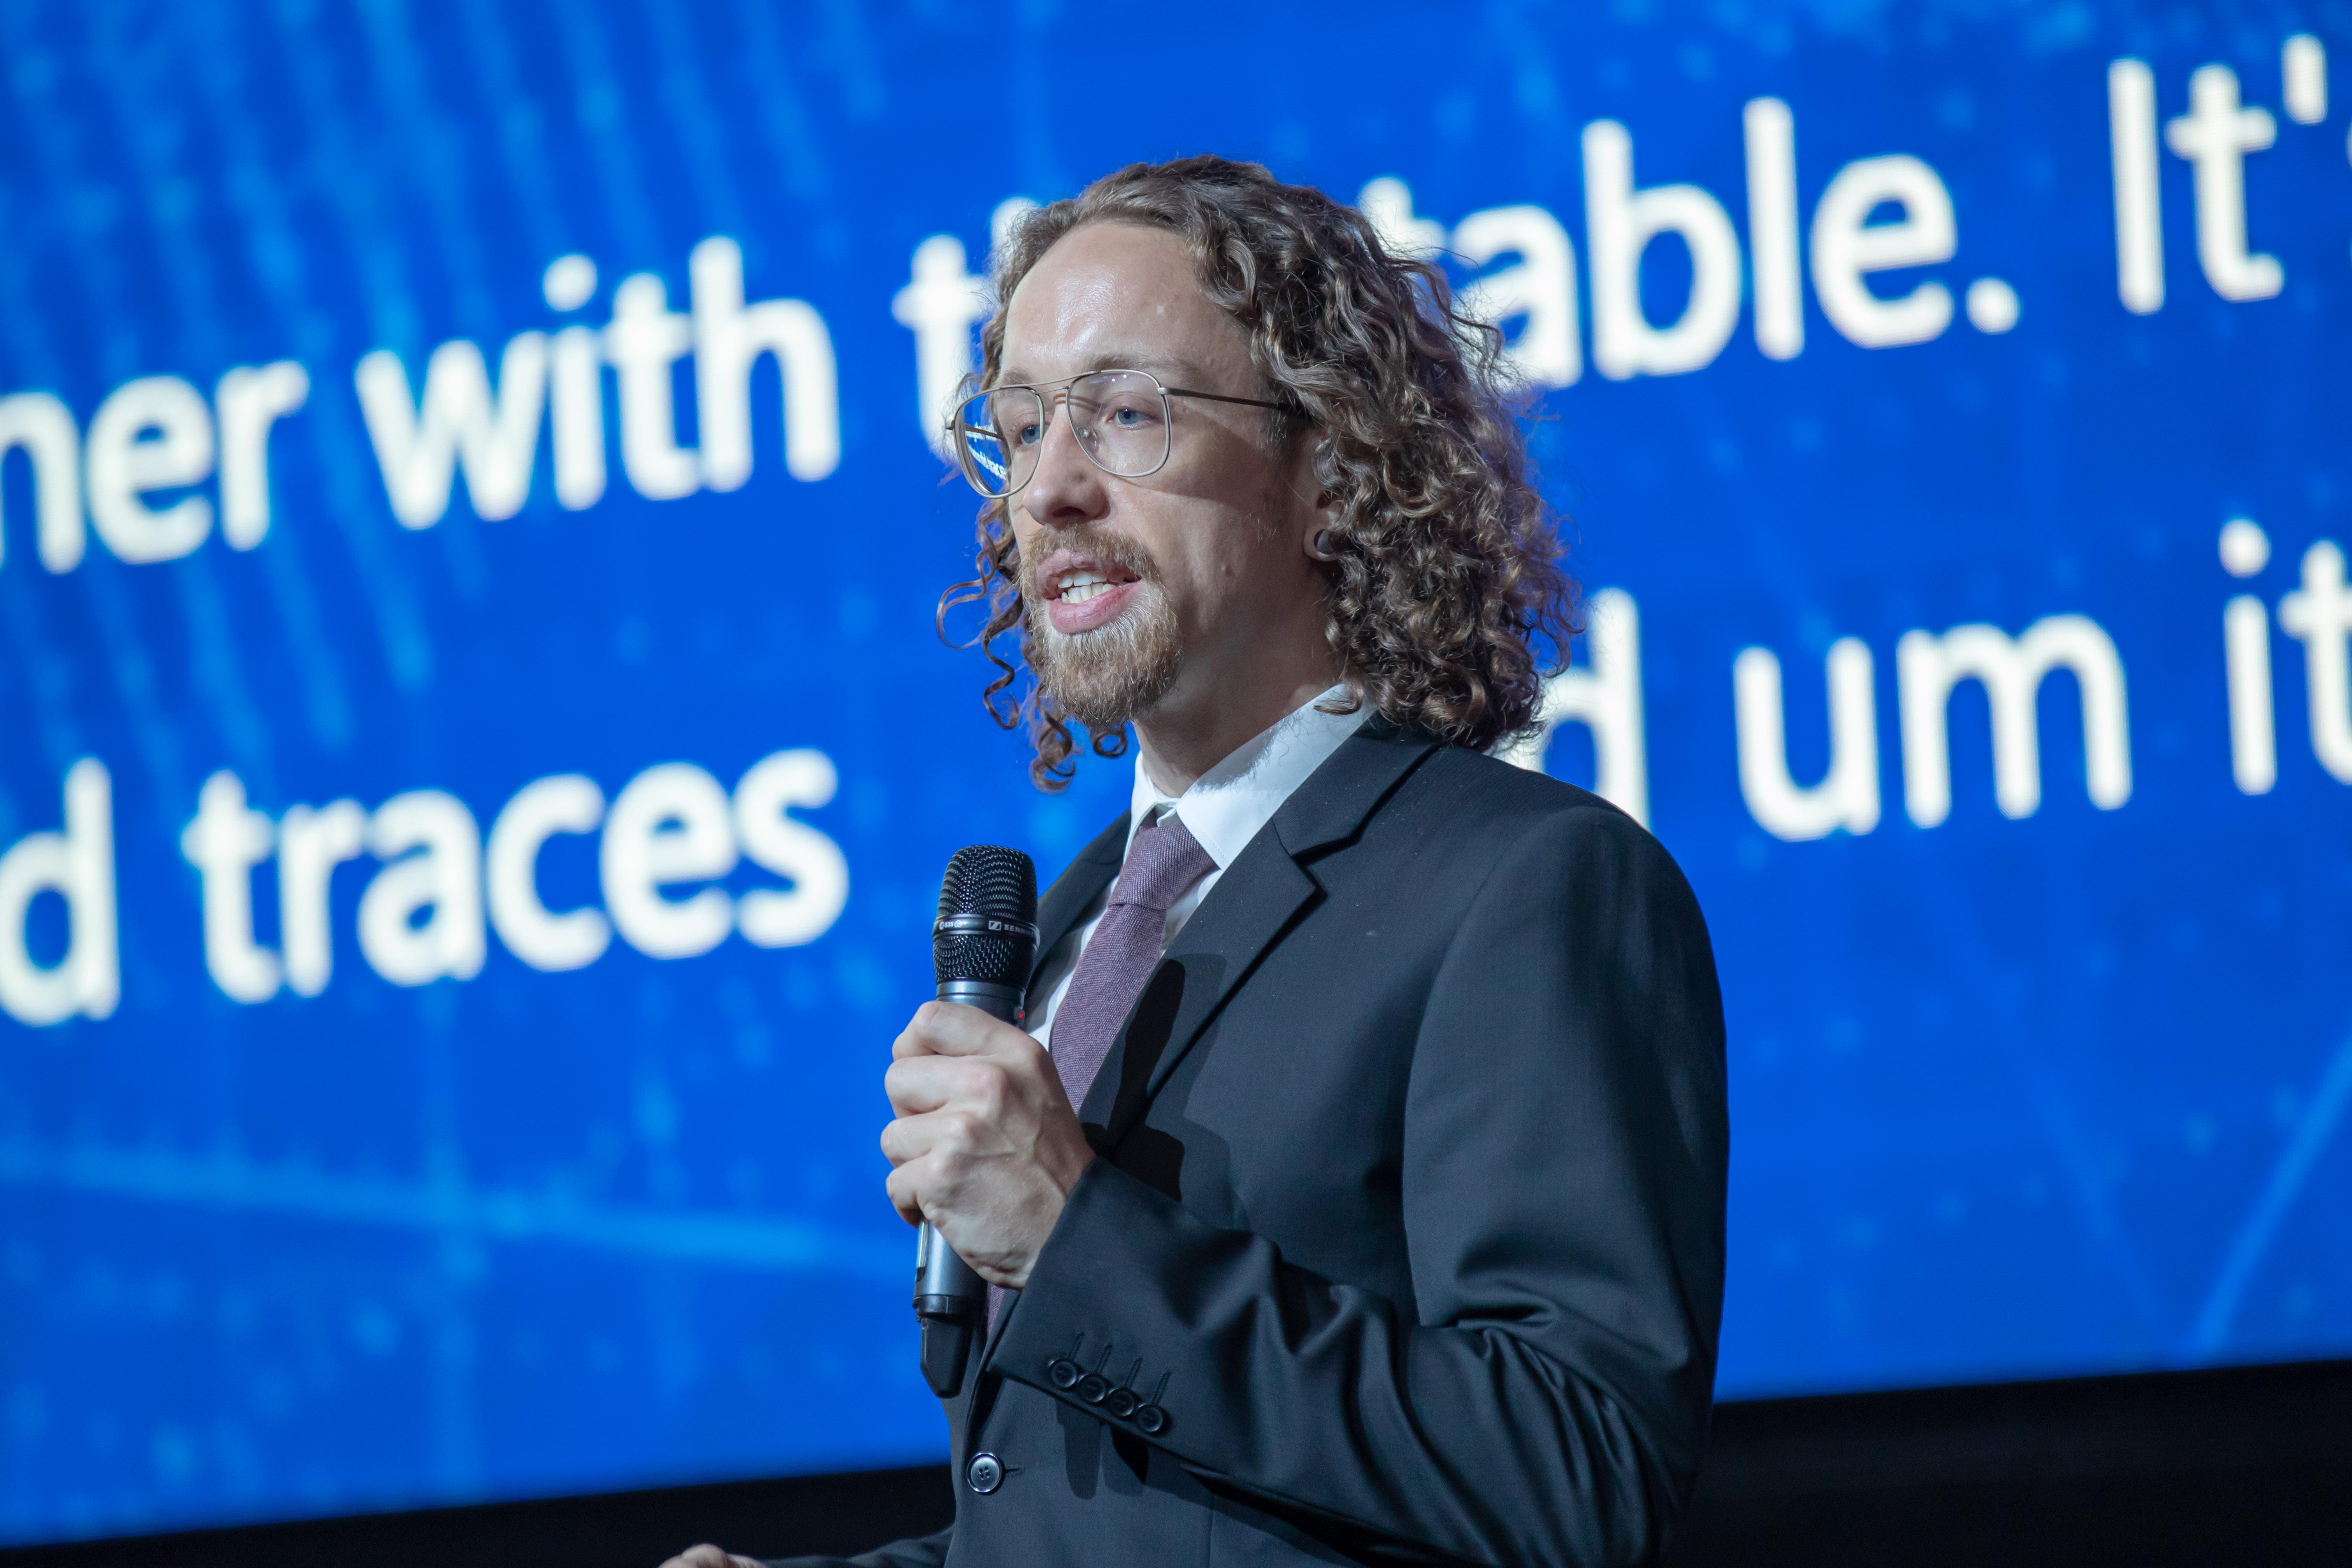 AI for Good Global Summit: Know-Center über Förderung des lebenslangen Lernens in der KI durch Technology Enhanced Learning